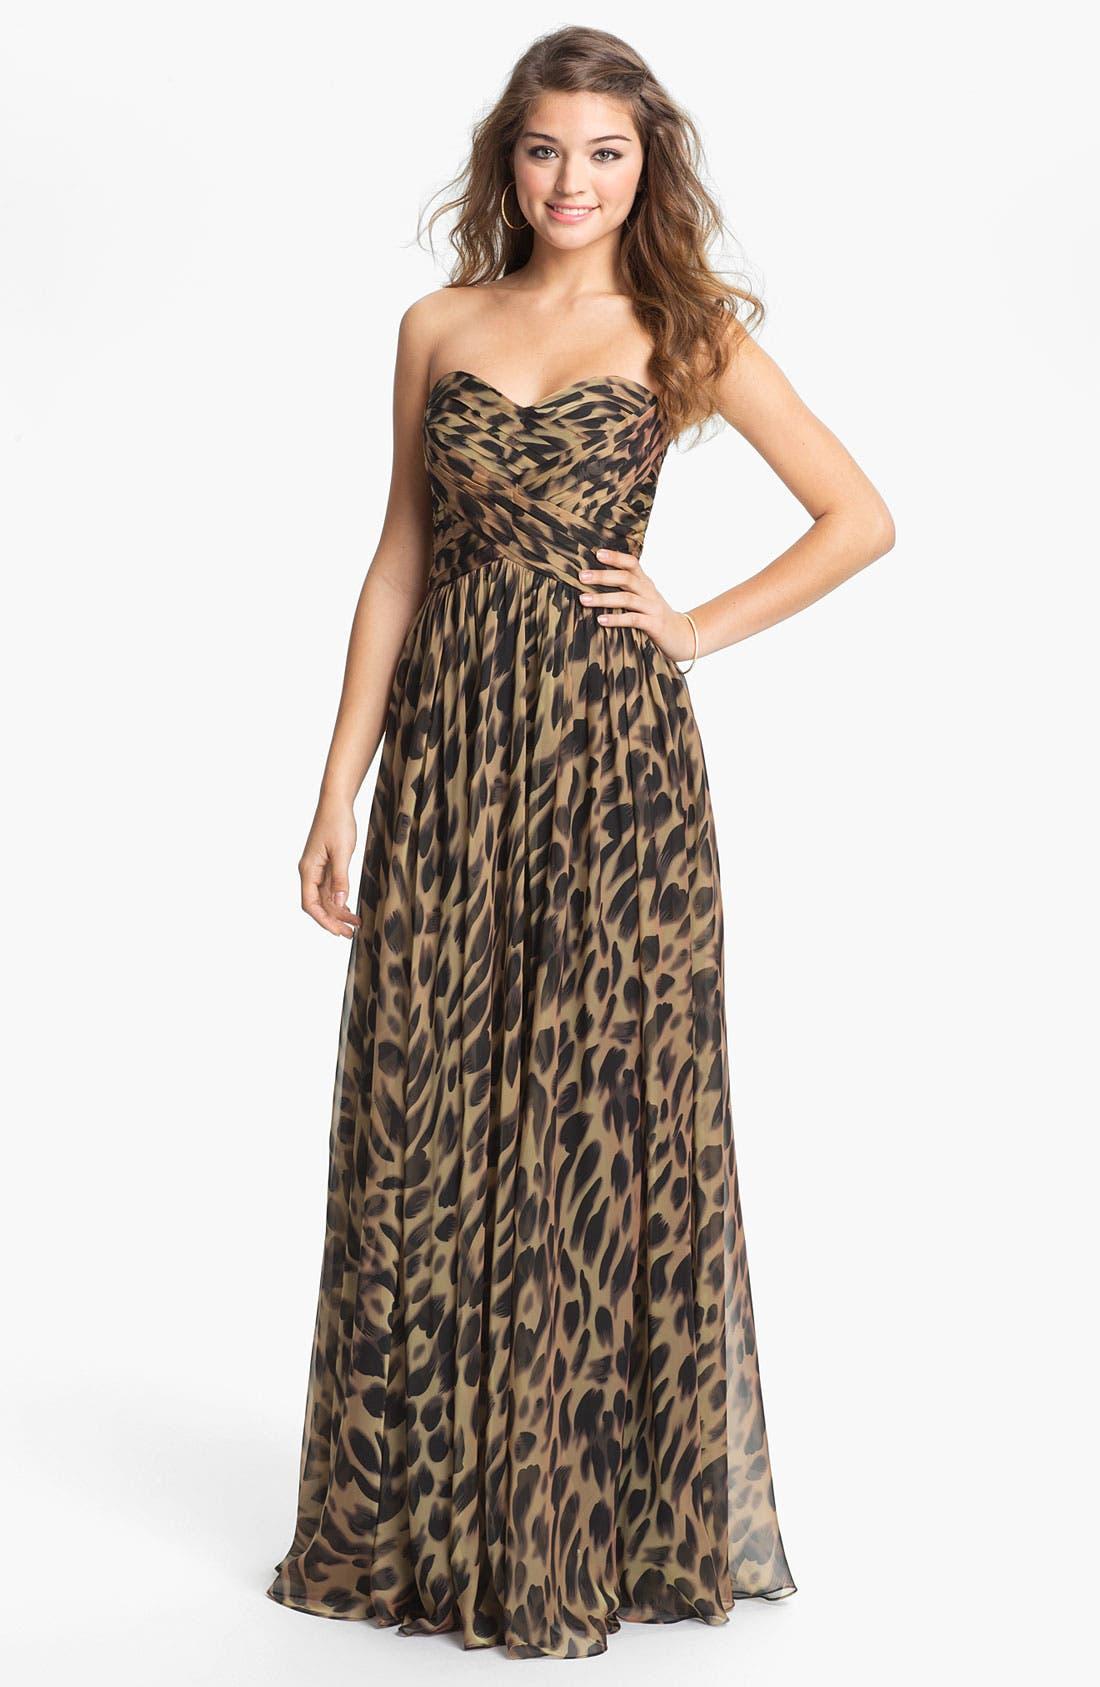 Alternate Image 1 Selected - La Femme Print Strapless Chiffon Gown